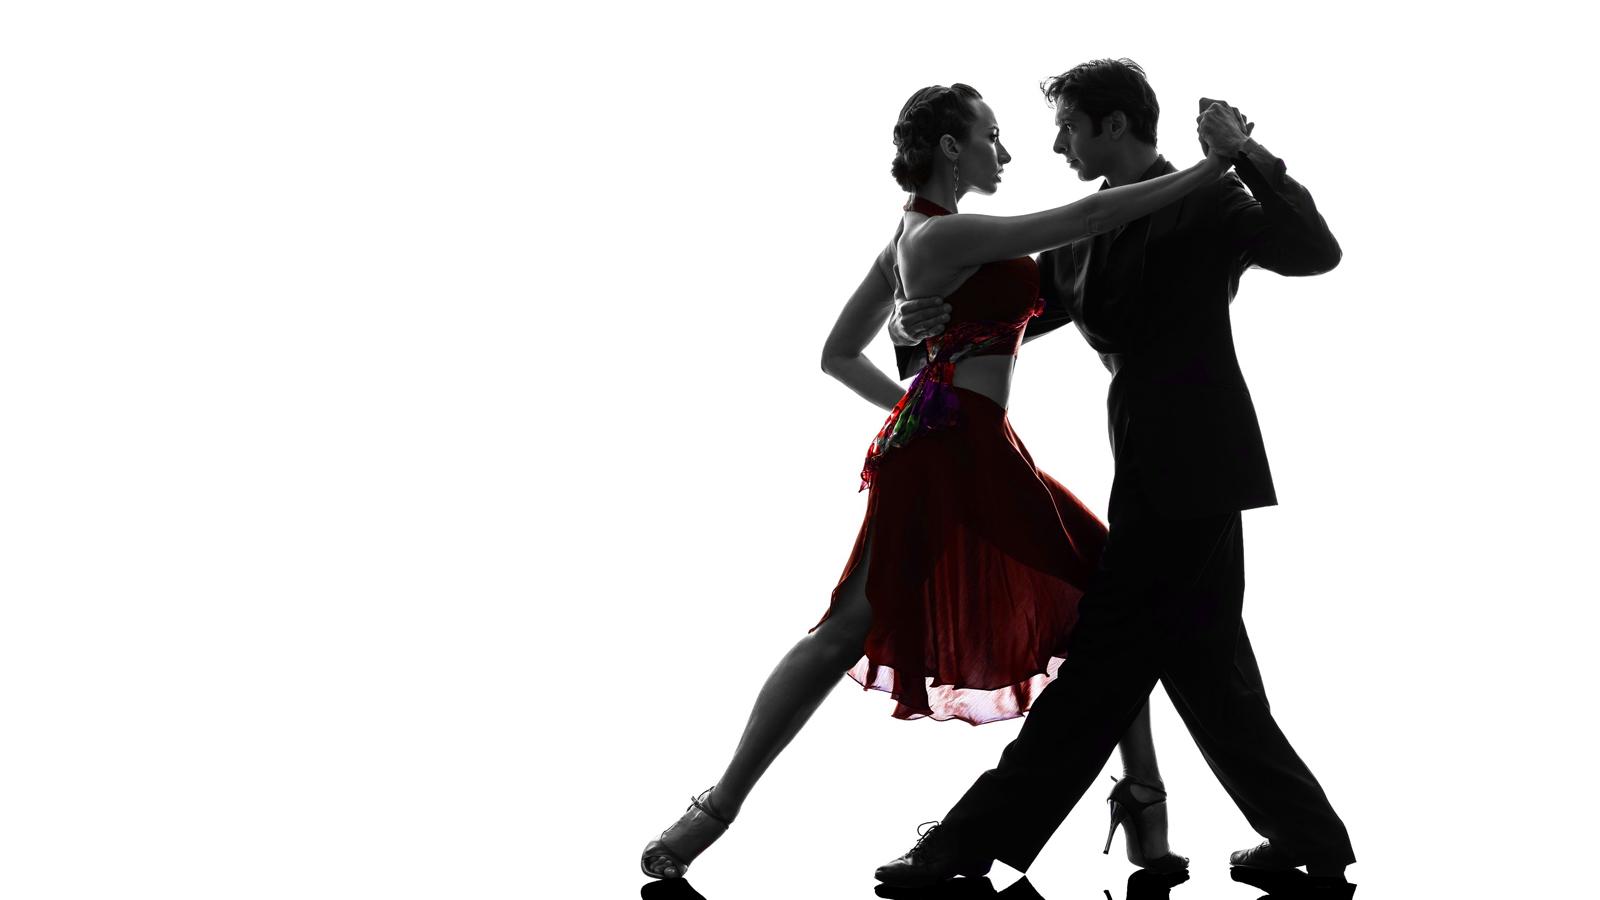 LEARN TO DANCE SALSA, CHA CHA, BACHATA, BELLYDANCING u0026 HIP HOP - Ballroom Dancing PNG HD